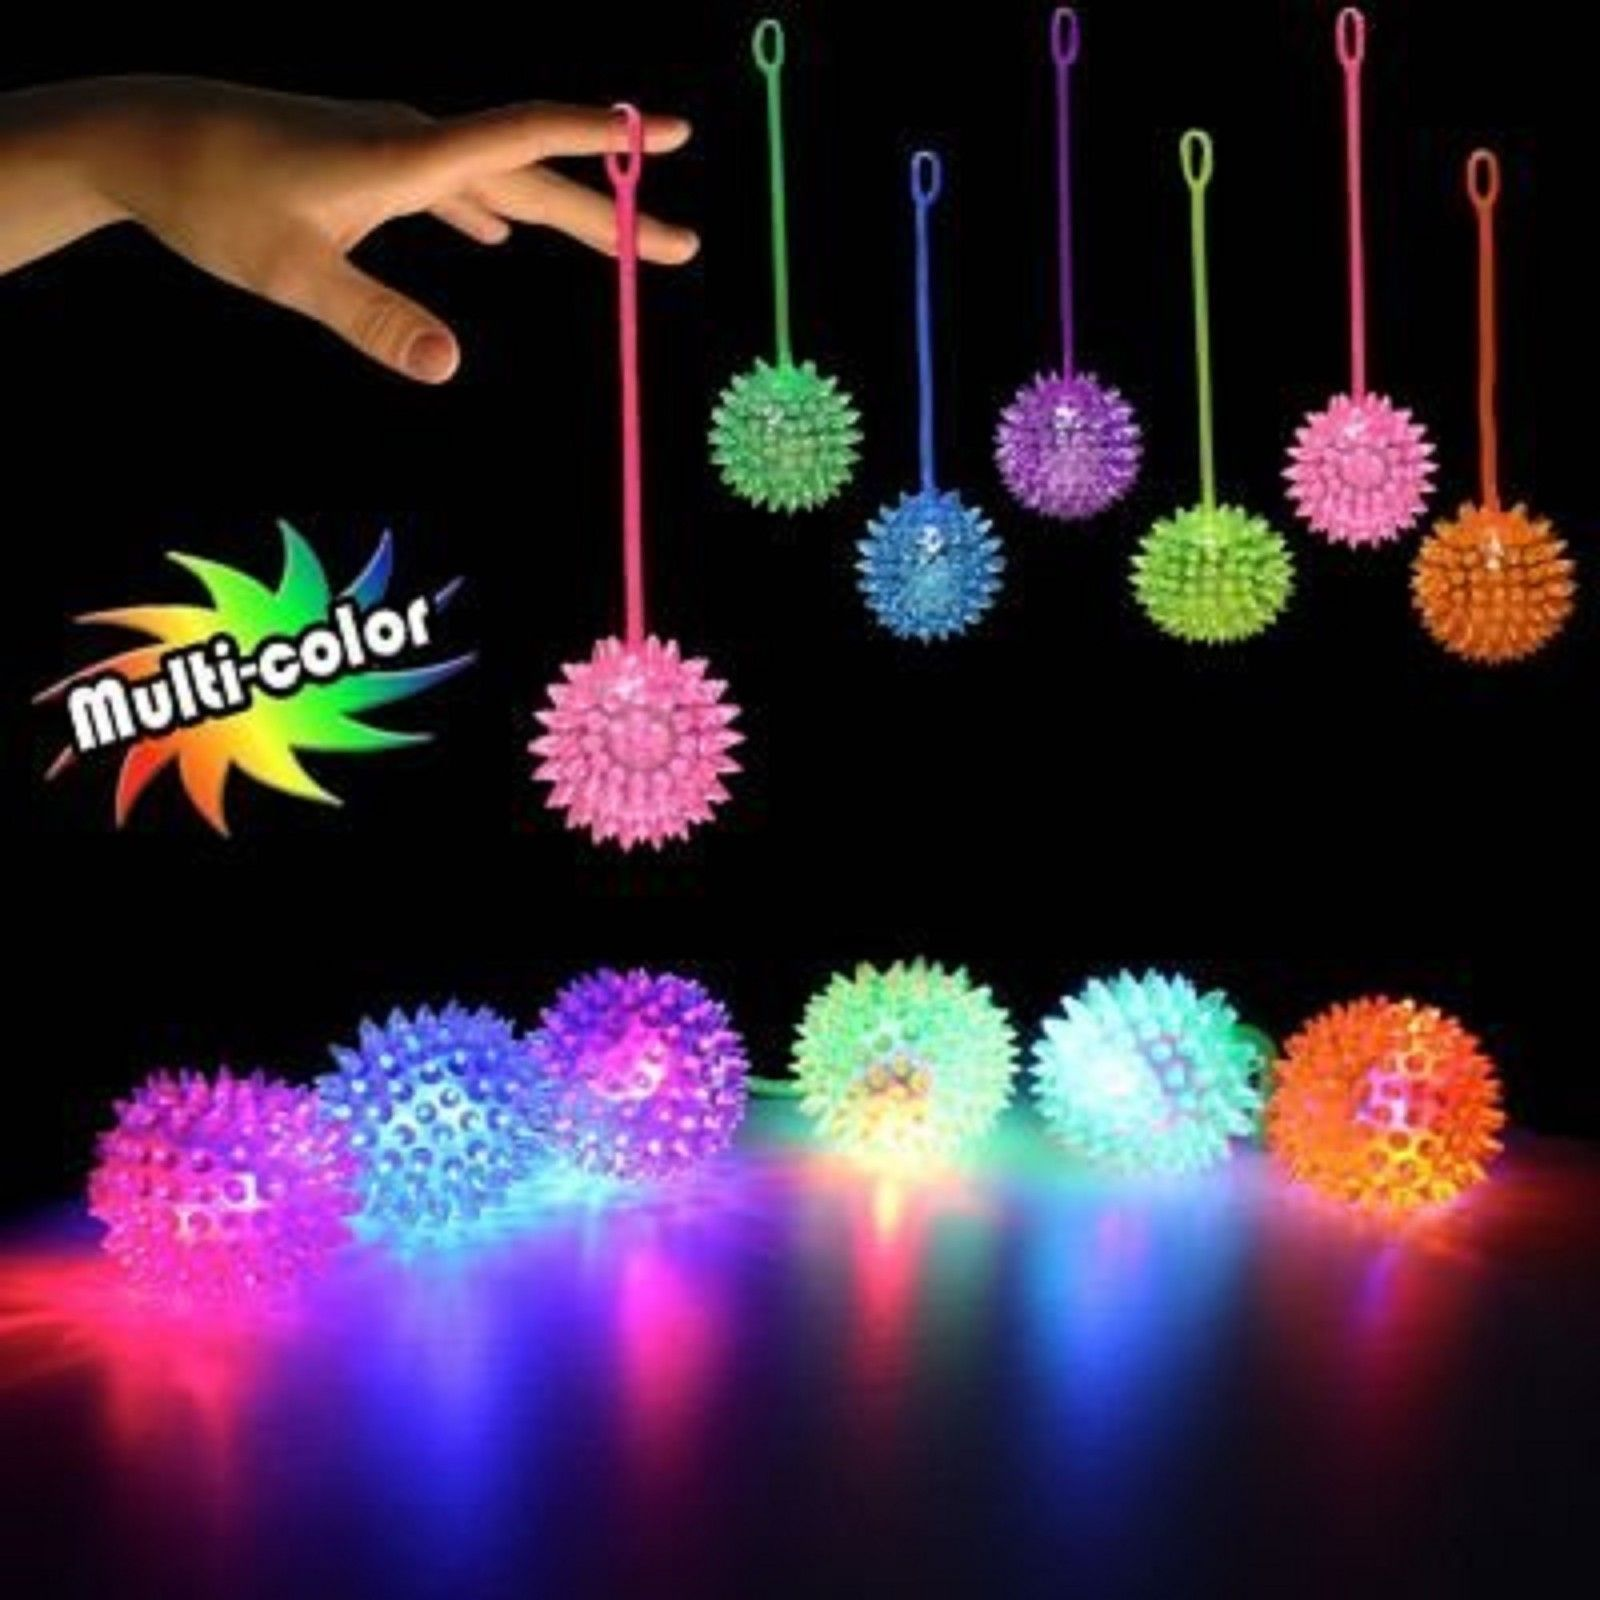 lighting ball v on golf asli co gradient up led light aetherair night flyer balls